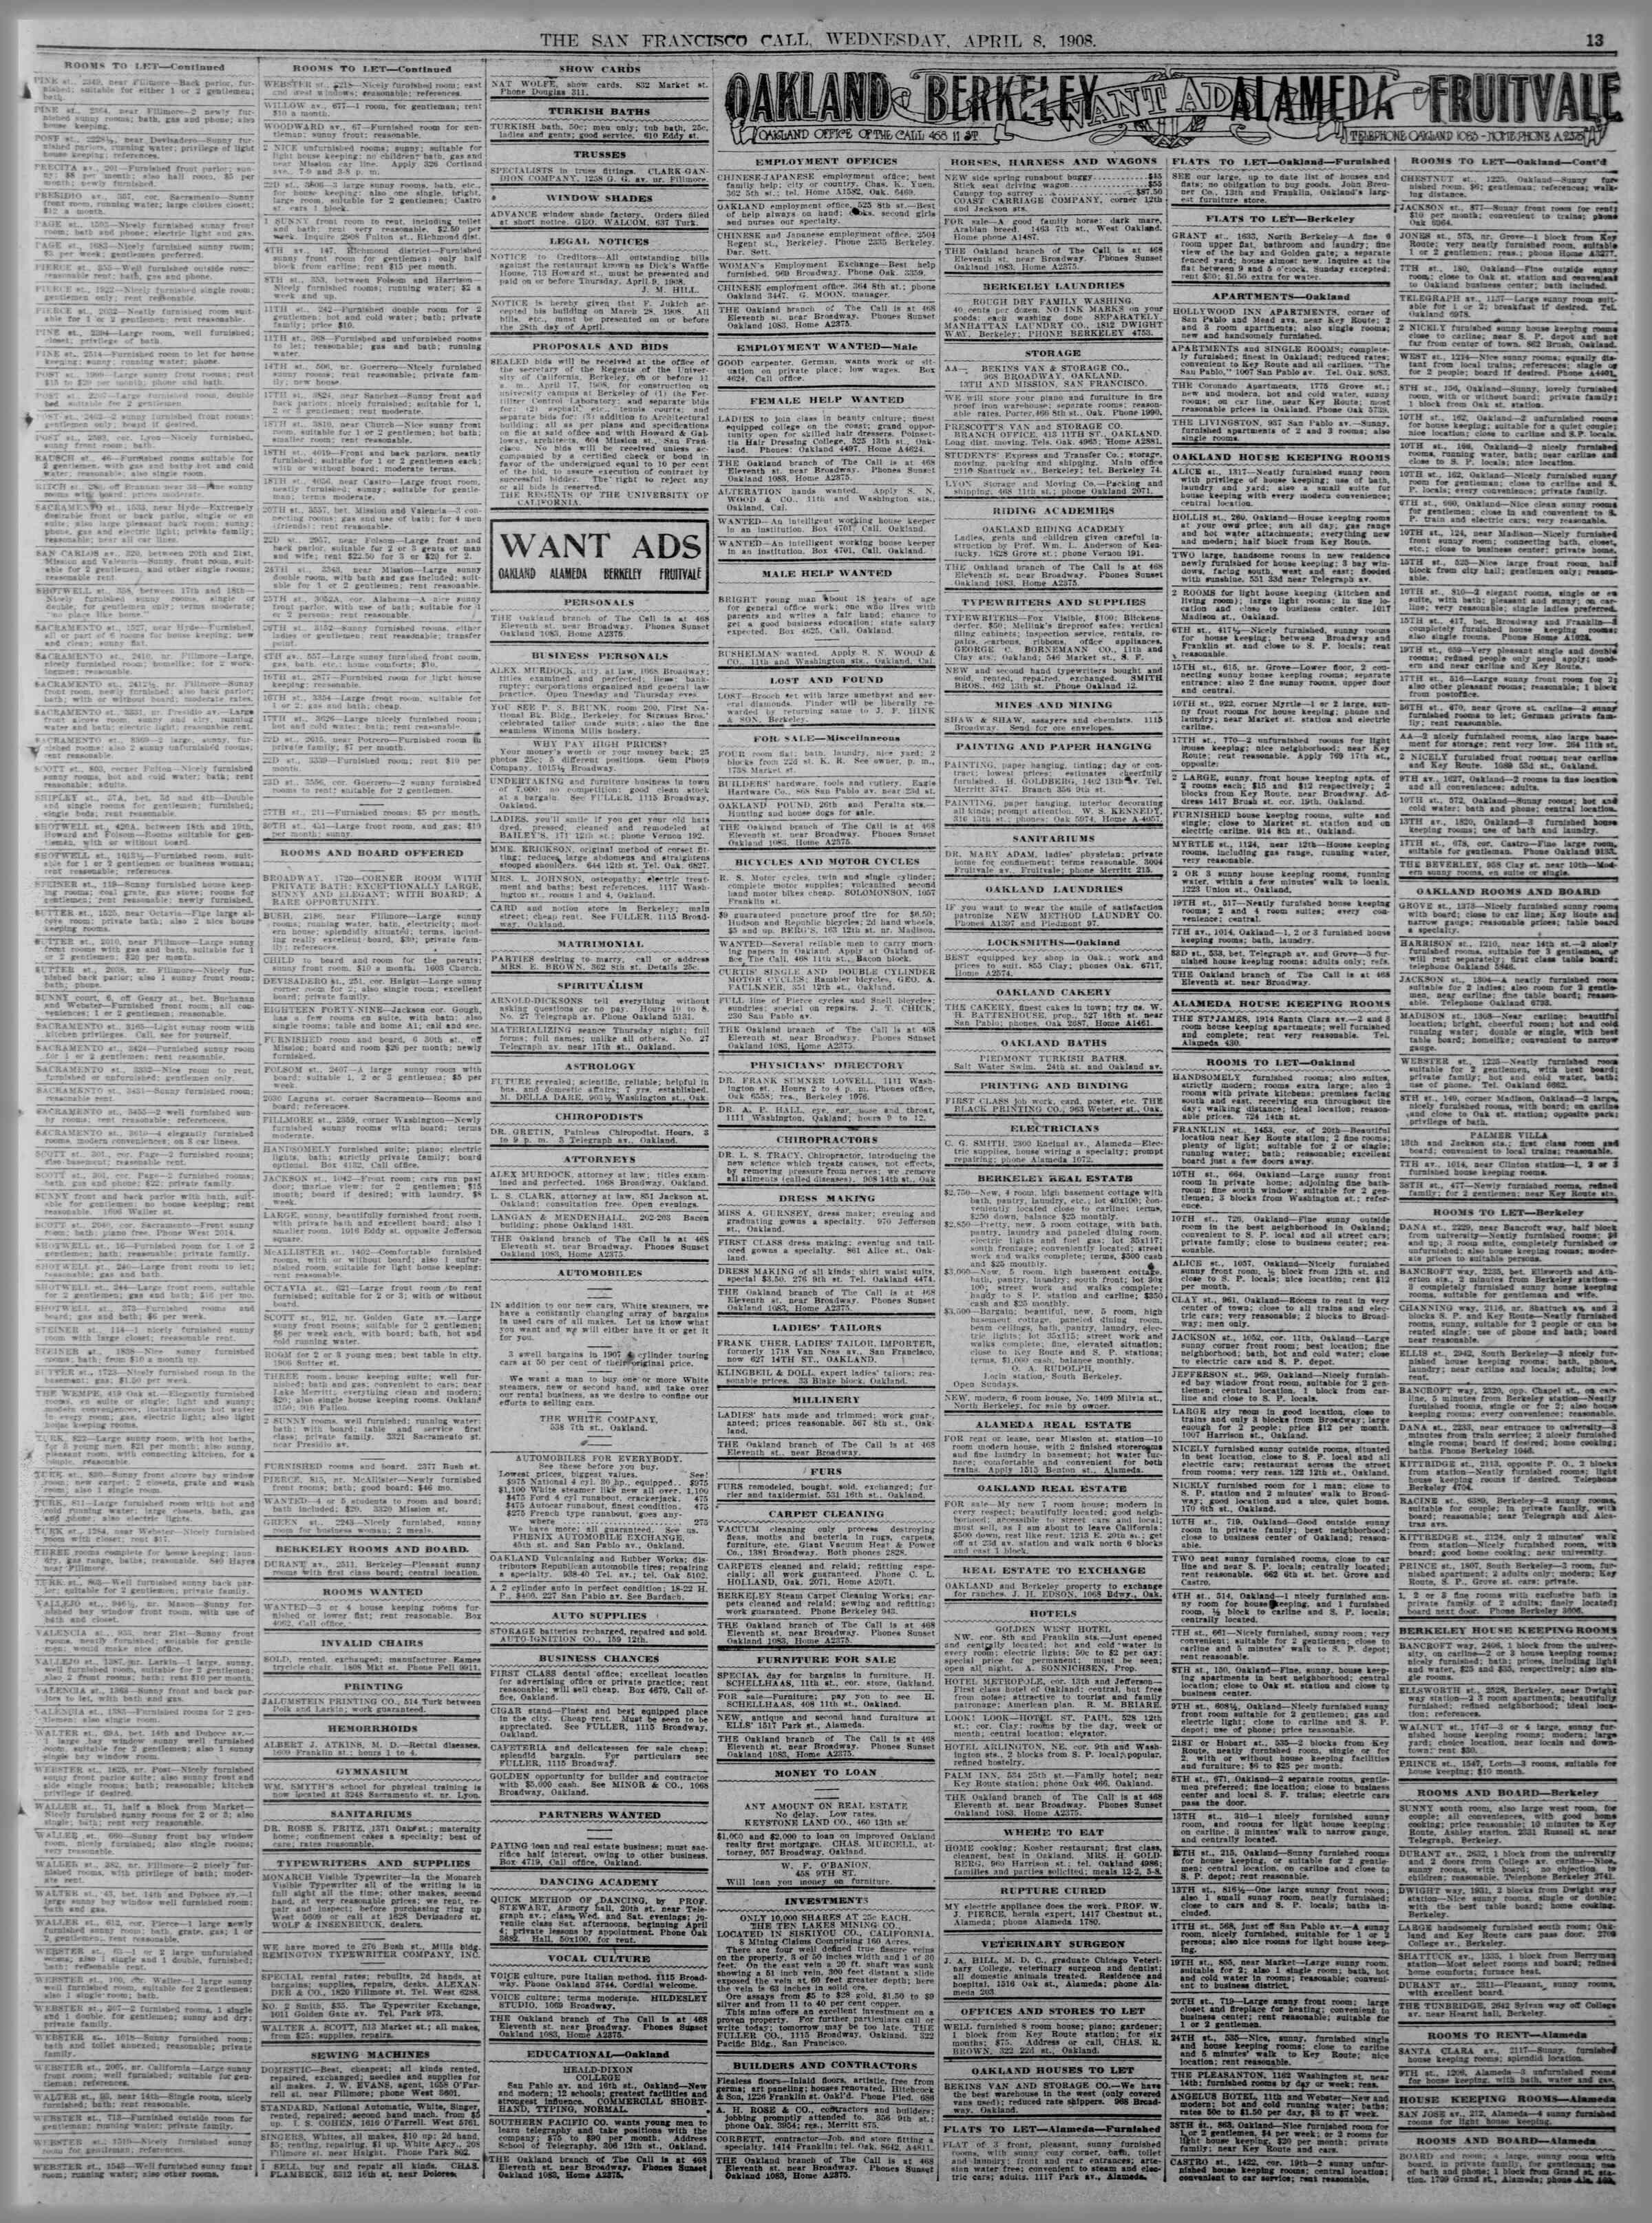 8 Nisan 1908 Tarihli The San Francisco Call Gazetesi Sayfa 13